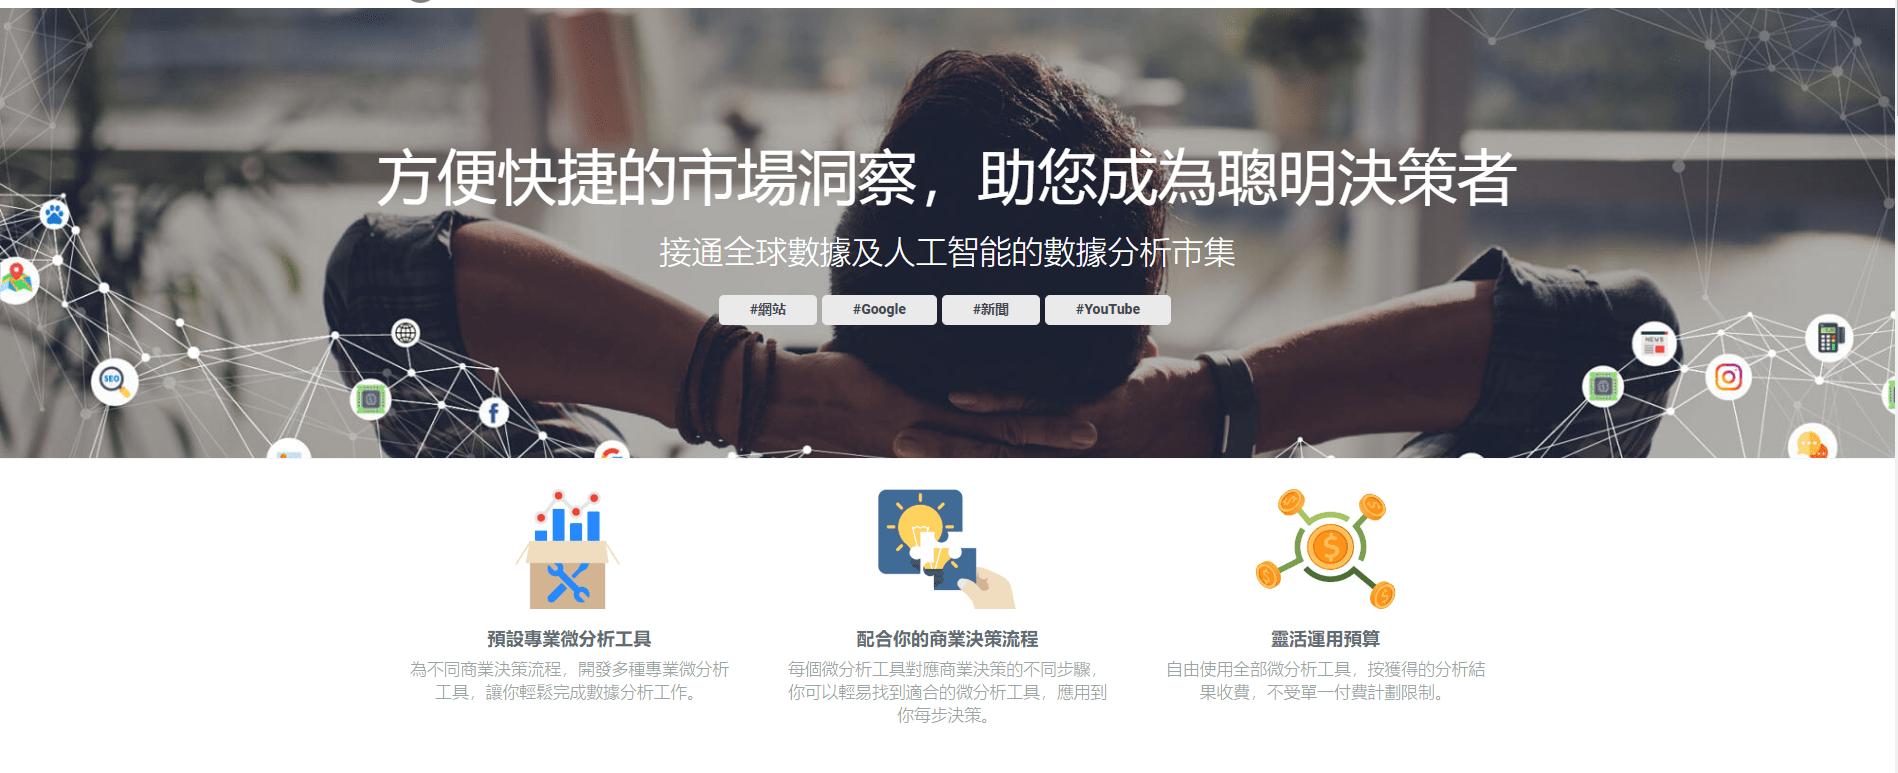 external data sources_platform